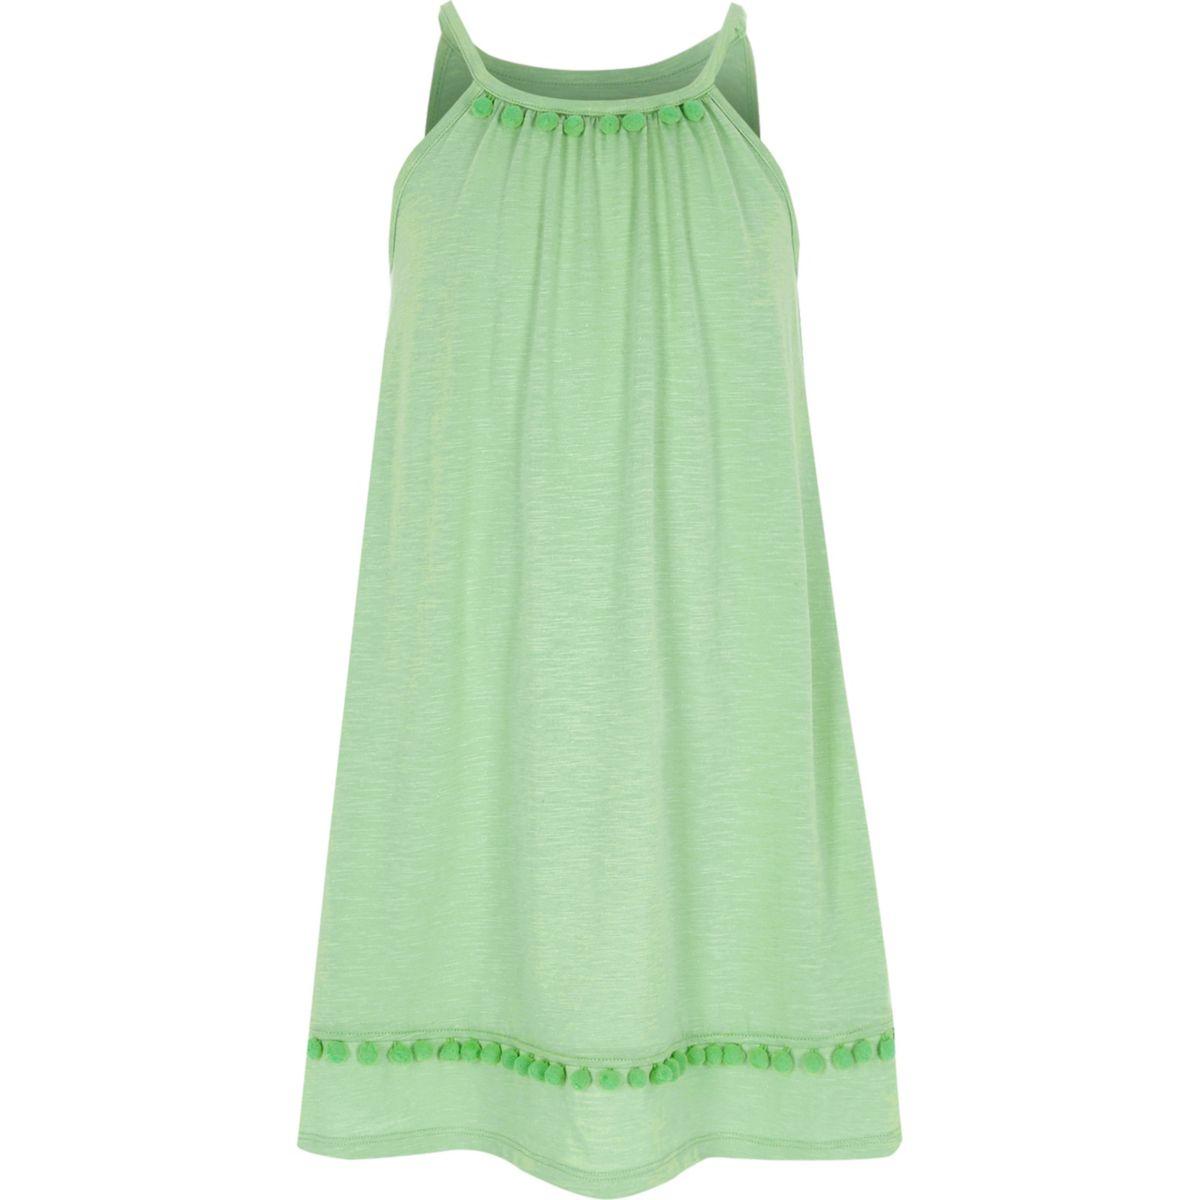 Girls light green pom pom trapeze dress